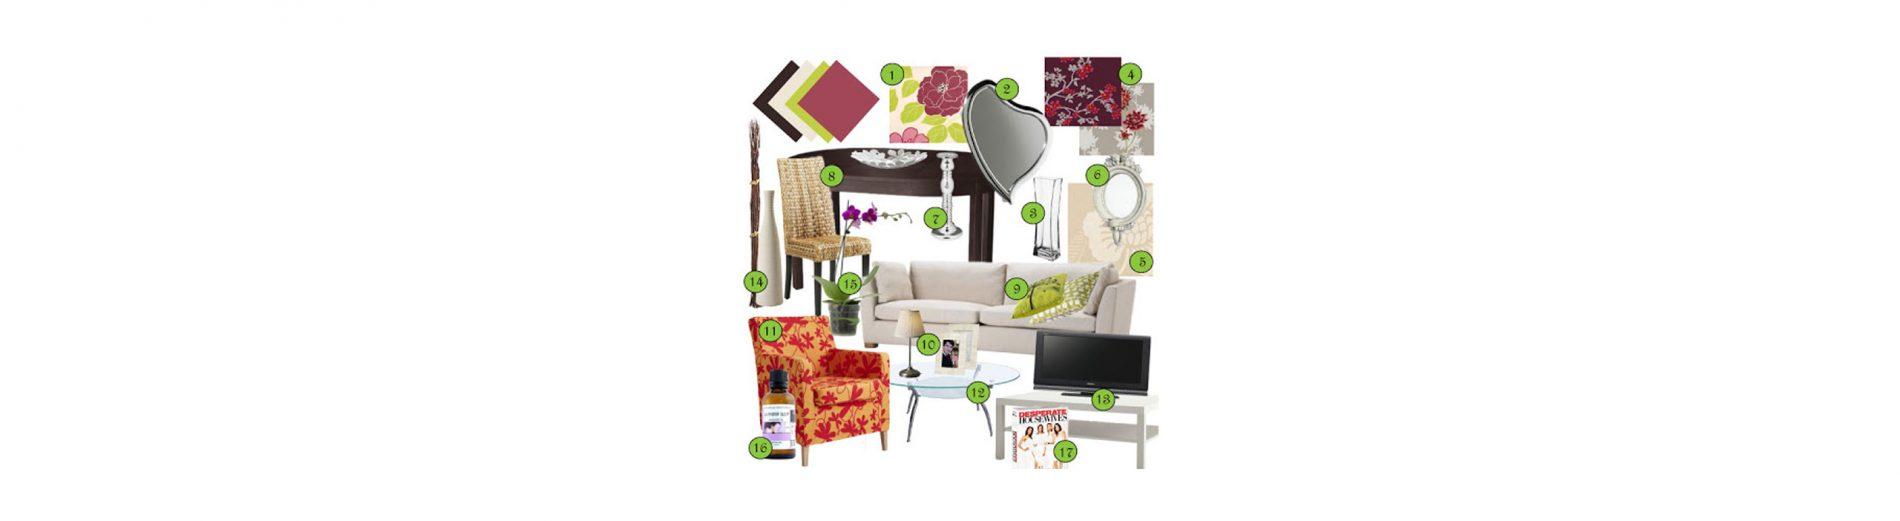 Mirror Used In Coronation Street Suppliers FurnitureInFashion